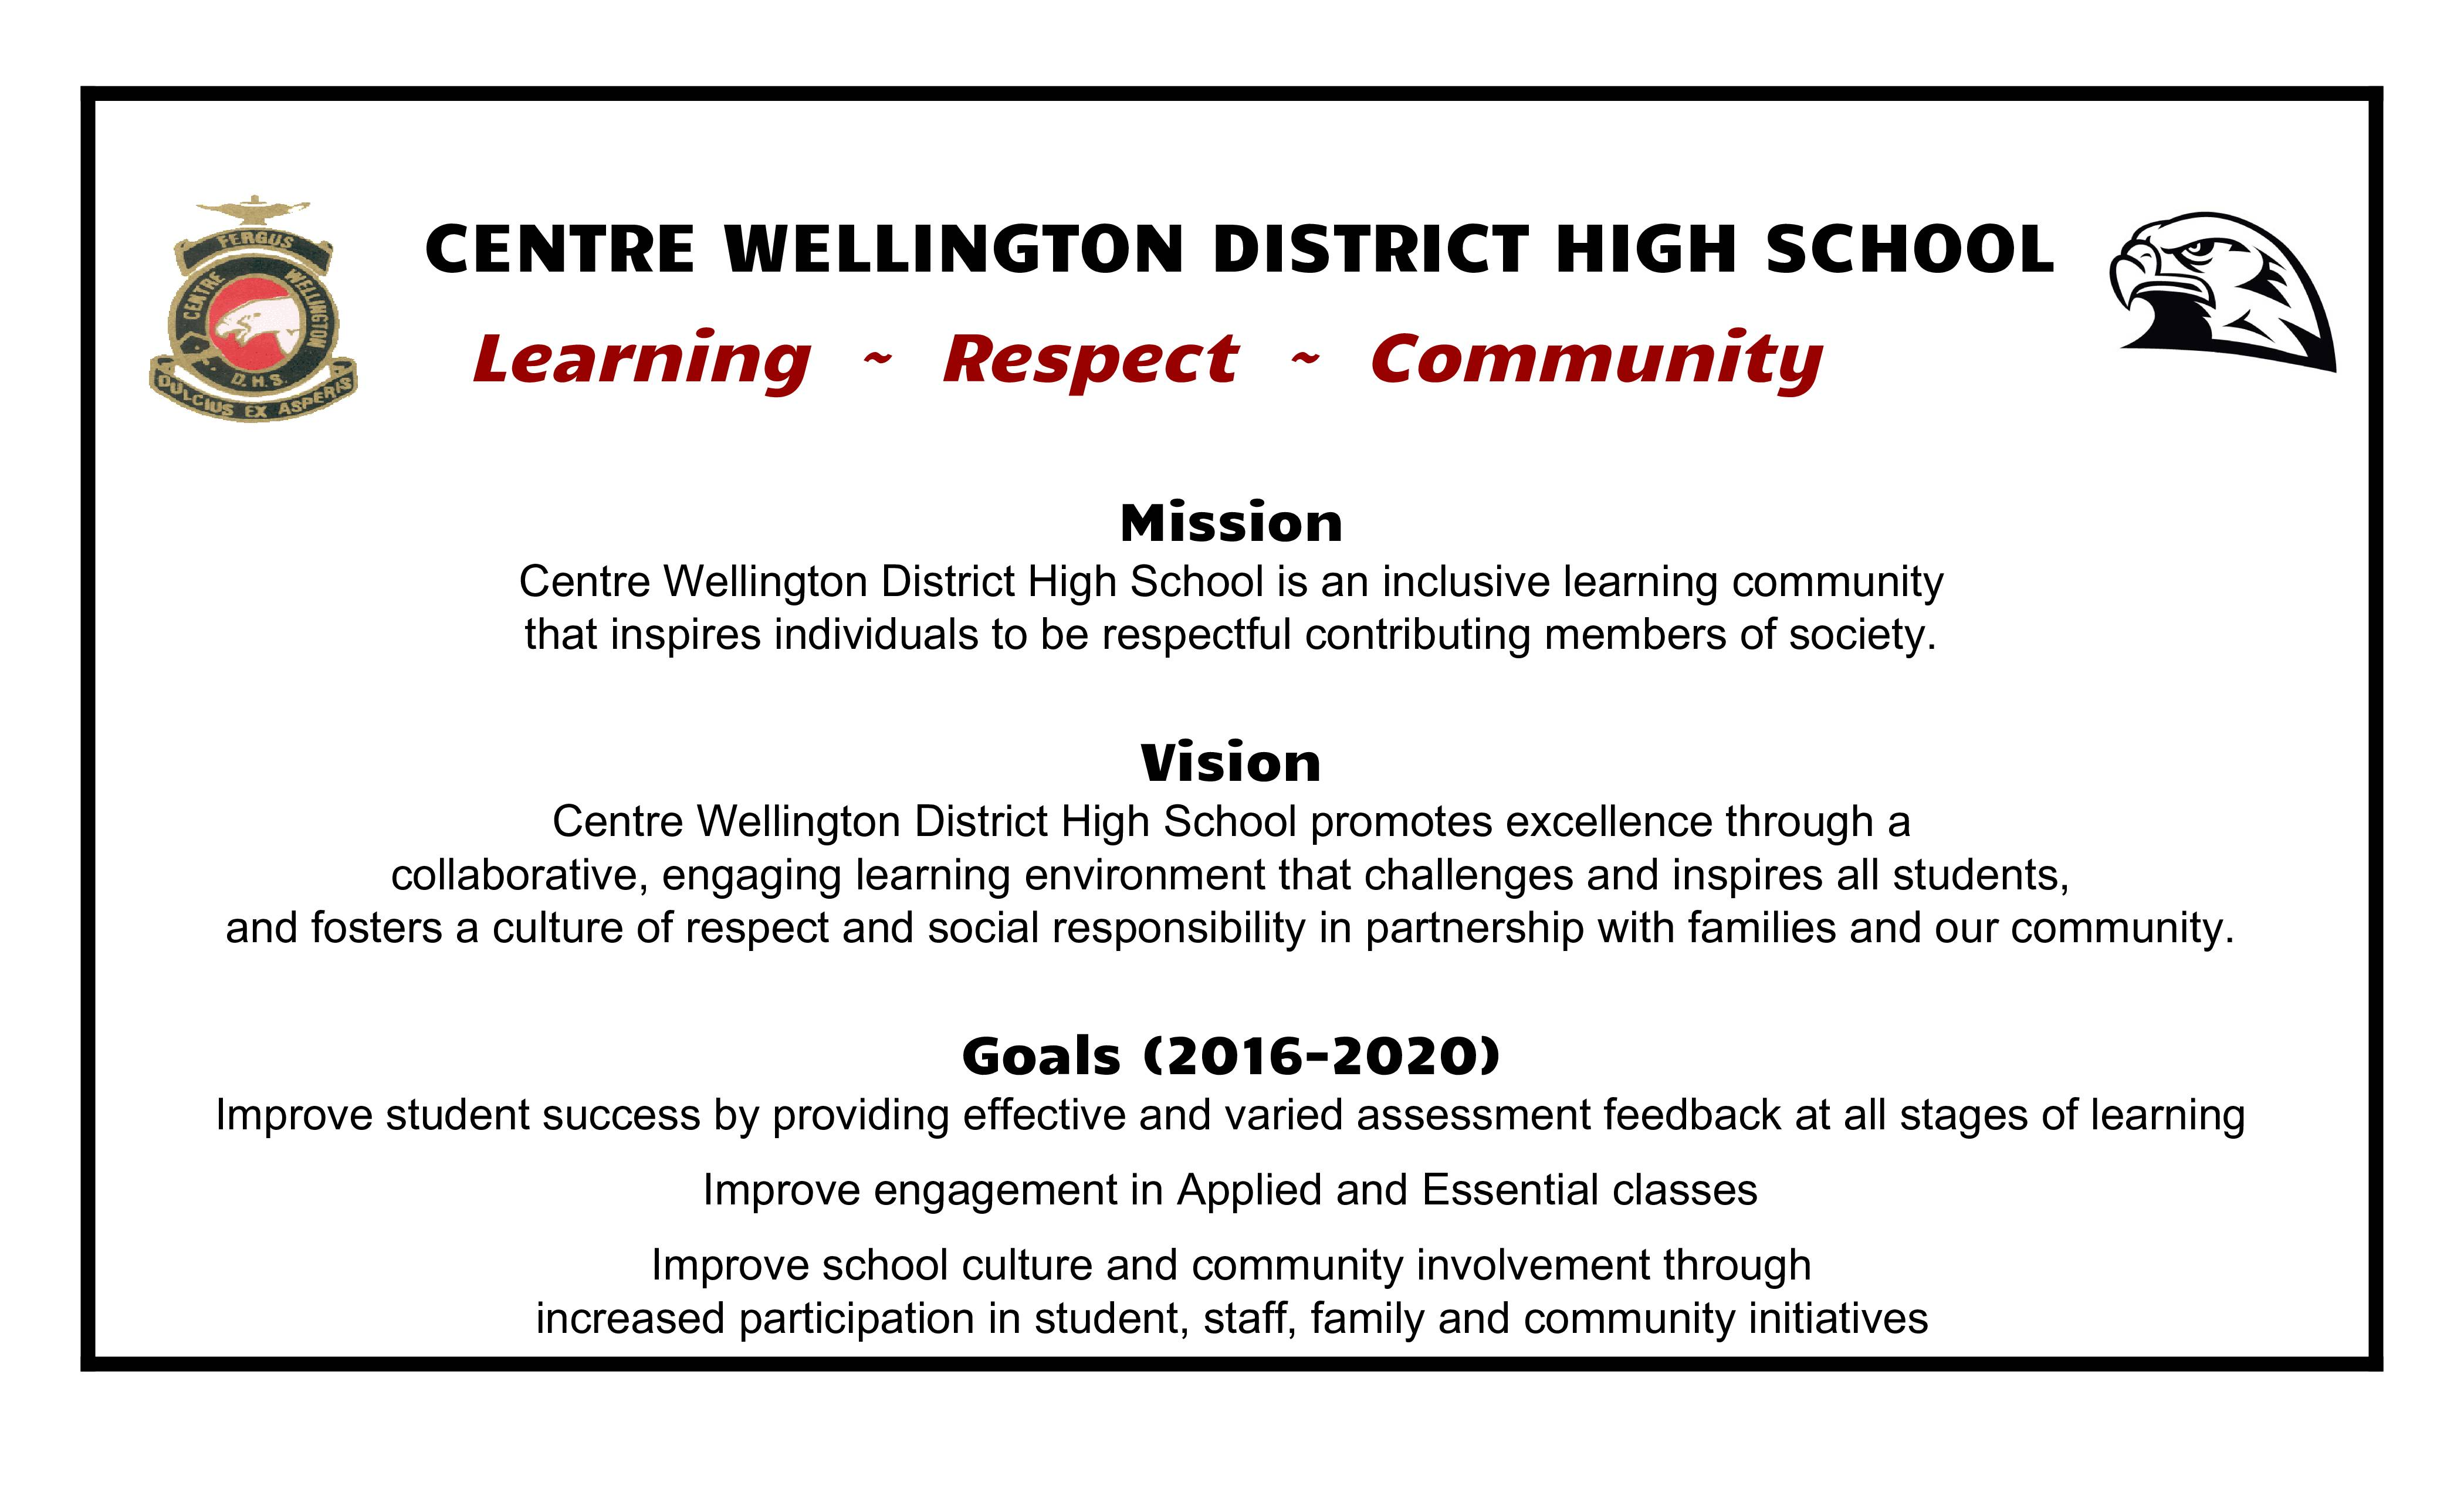 centre wellington district high school cwdhs mission vision goals 2016 2020